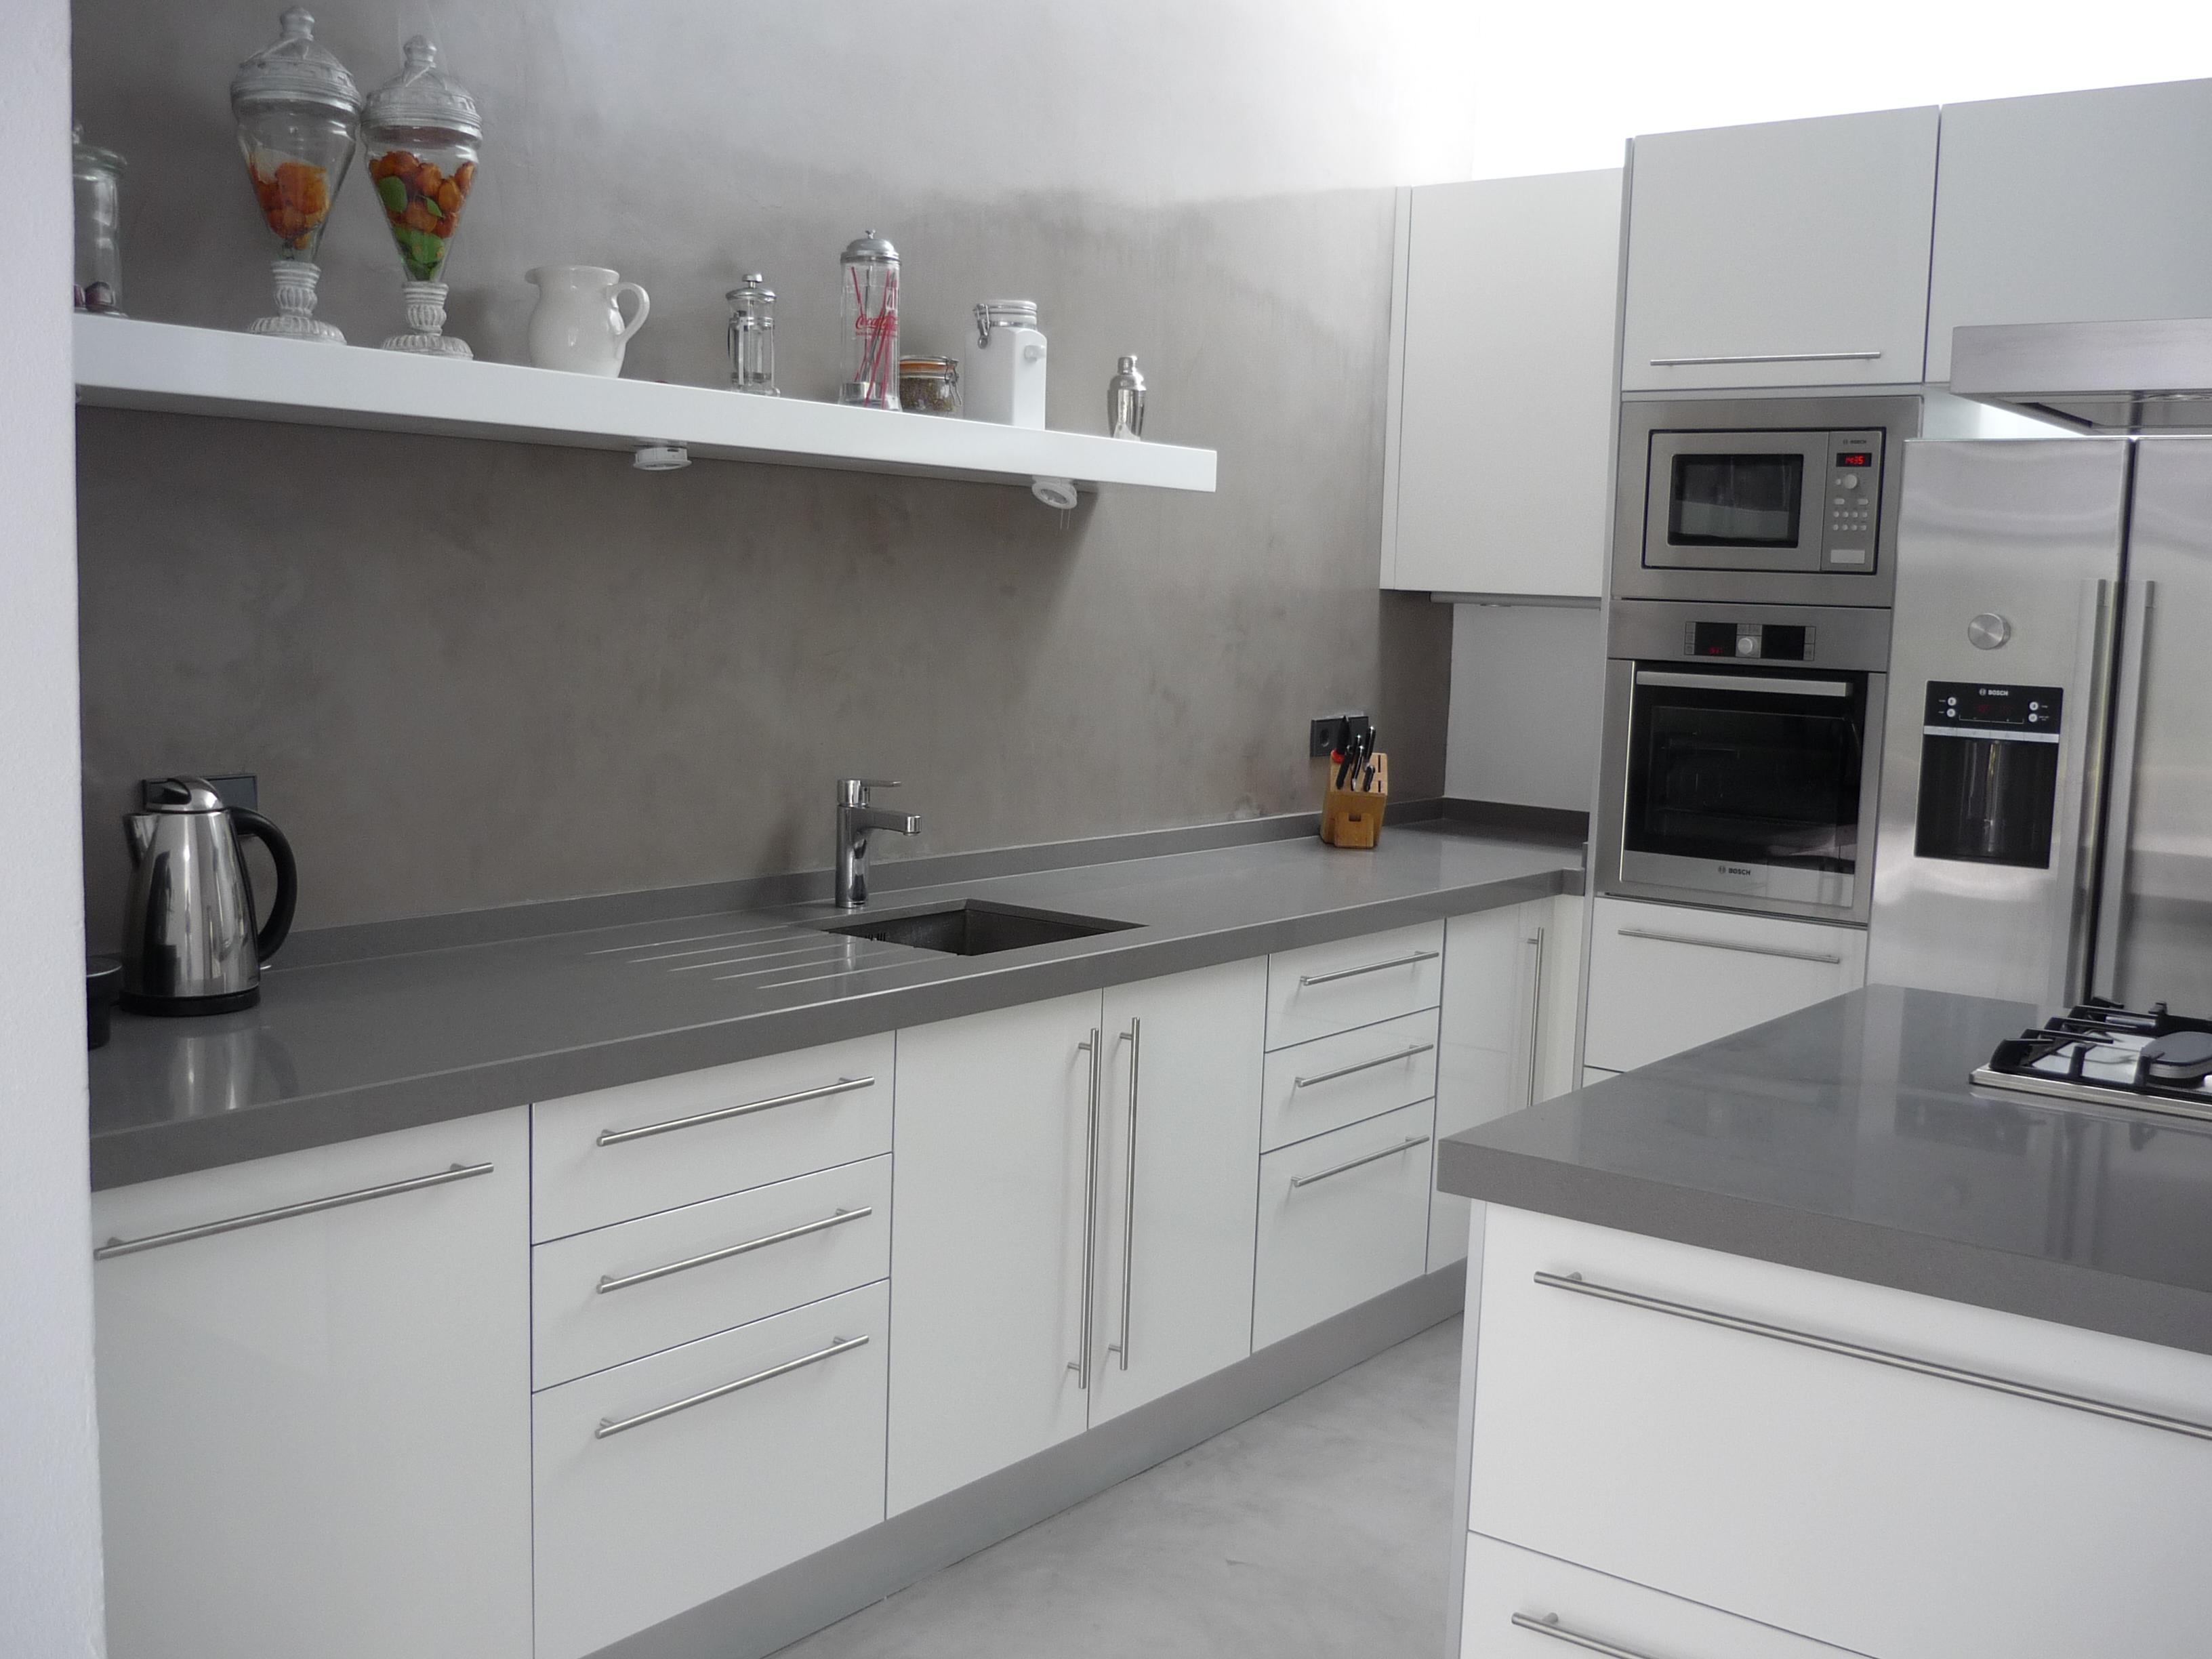 Cocina eivicuines acrilux blanco brillo eivicuines eva for Cocinas gris con blanco